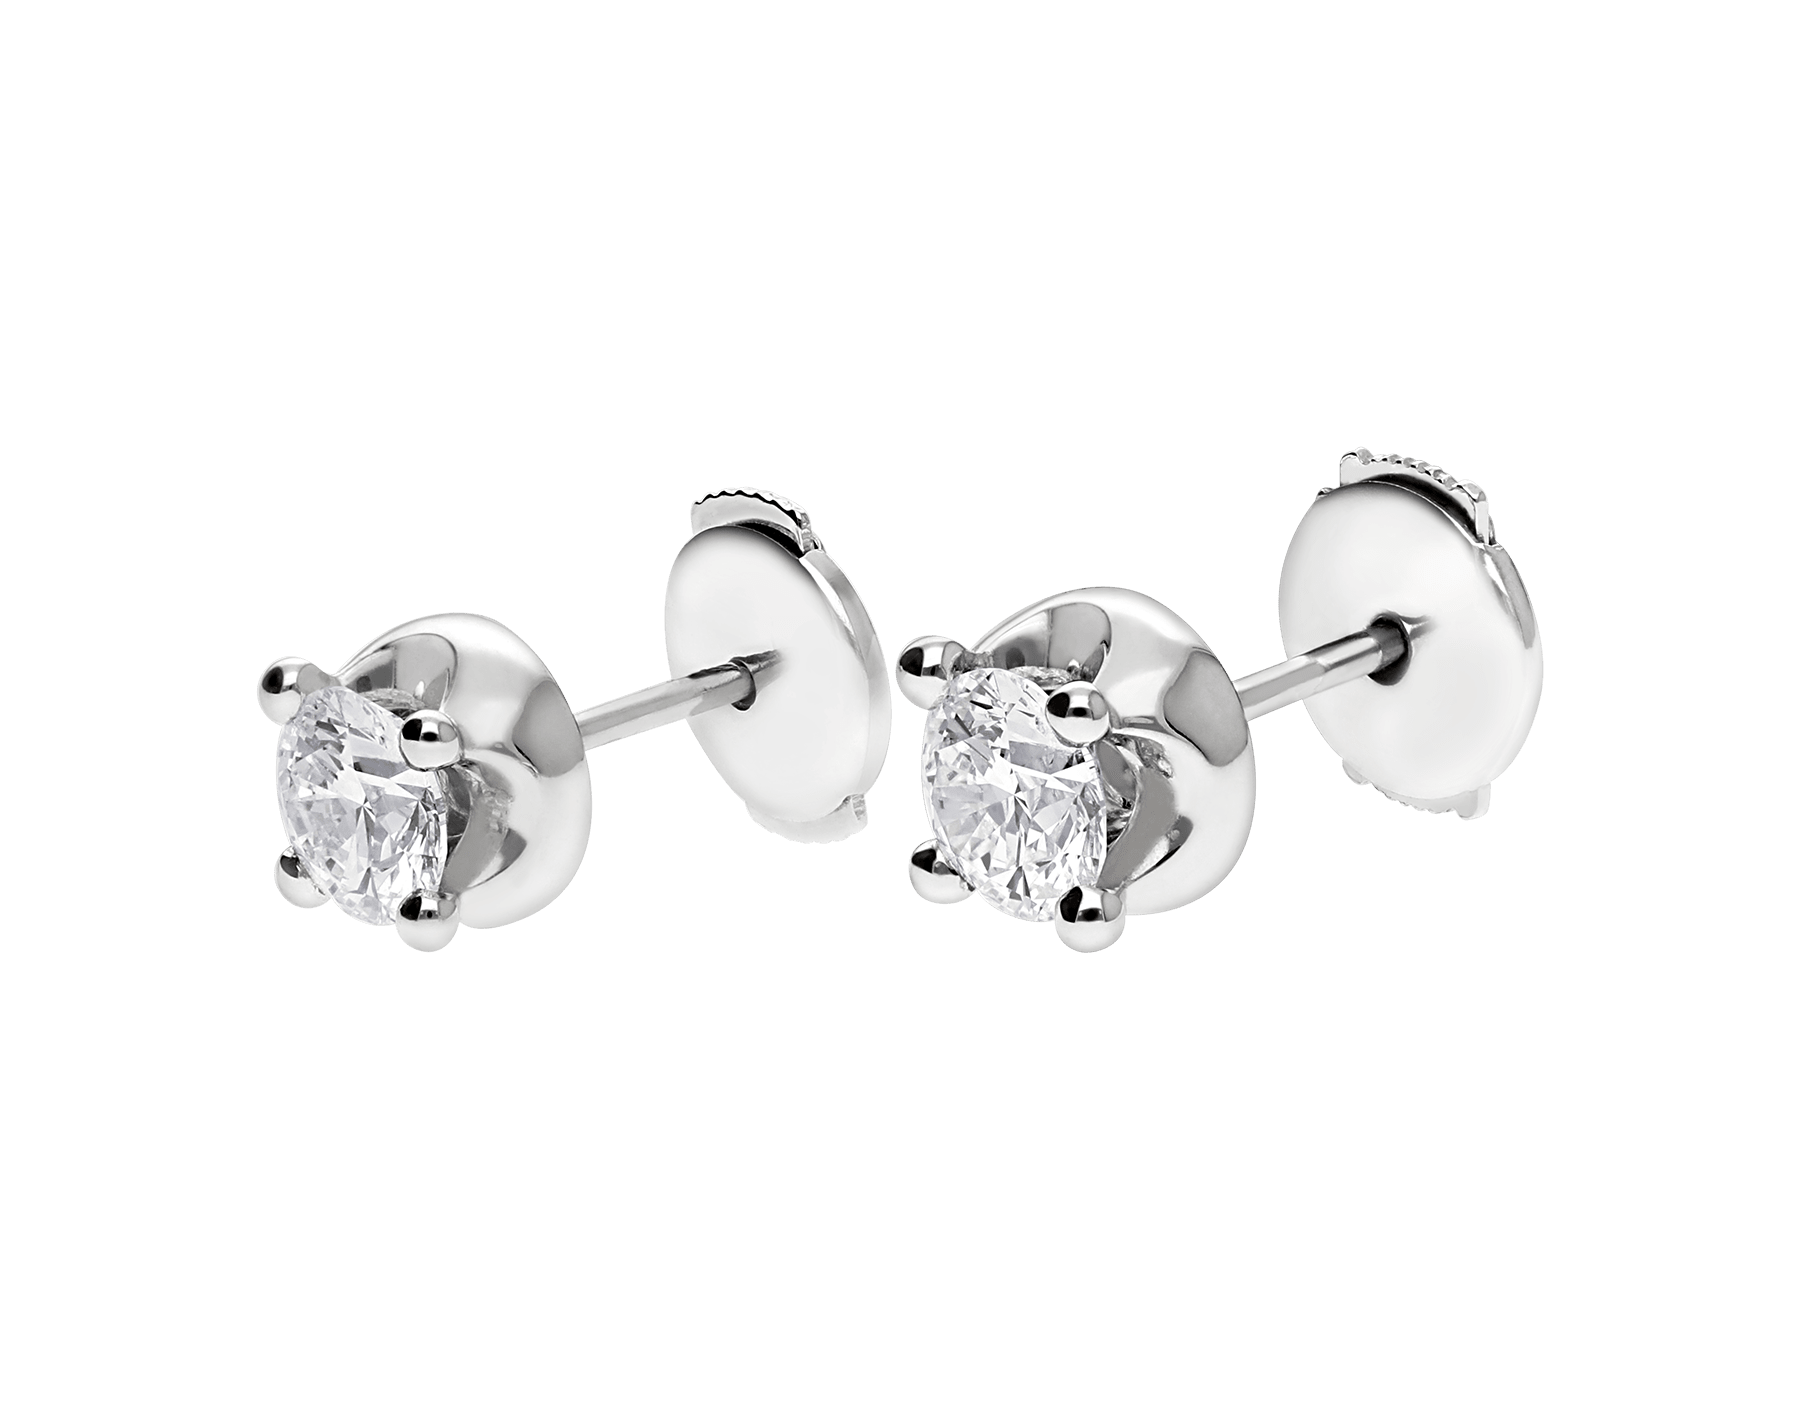 Corona 18 kt white gold earrings set with round brilliant cut diamonds OR-CORONA image 2